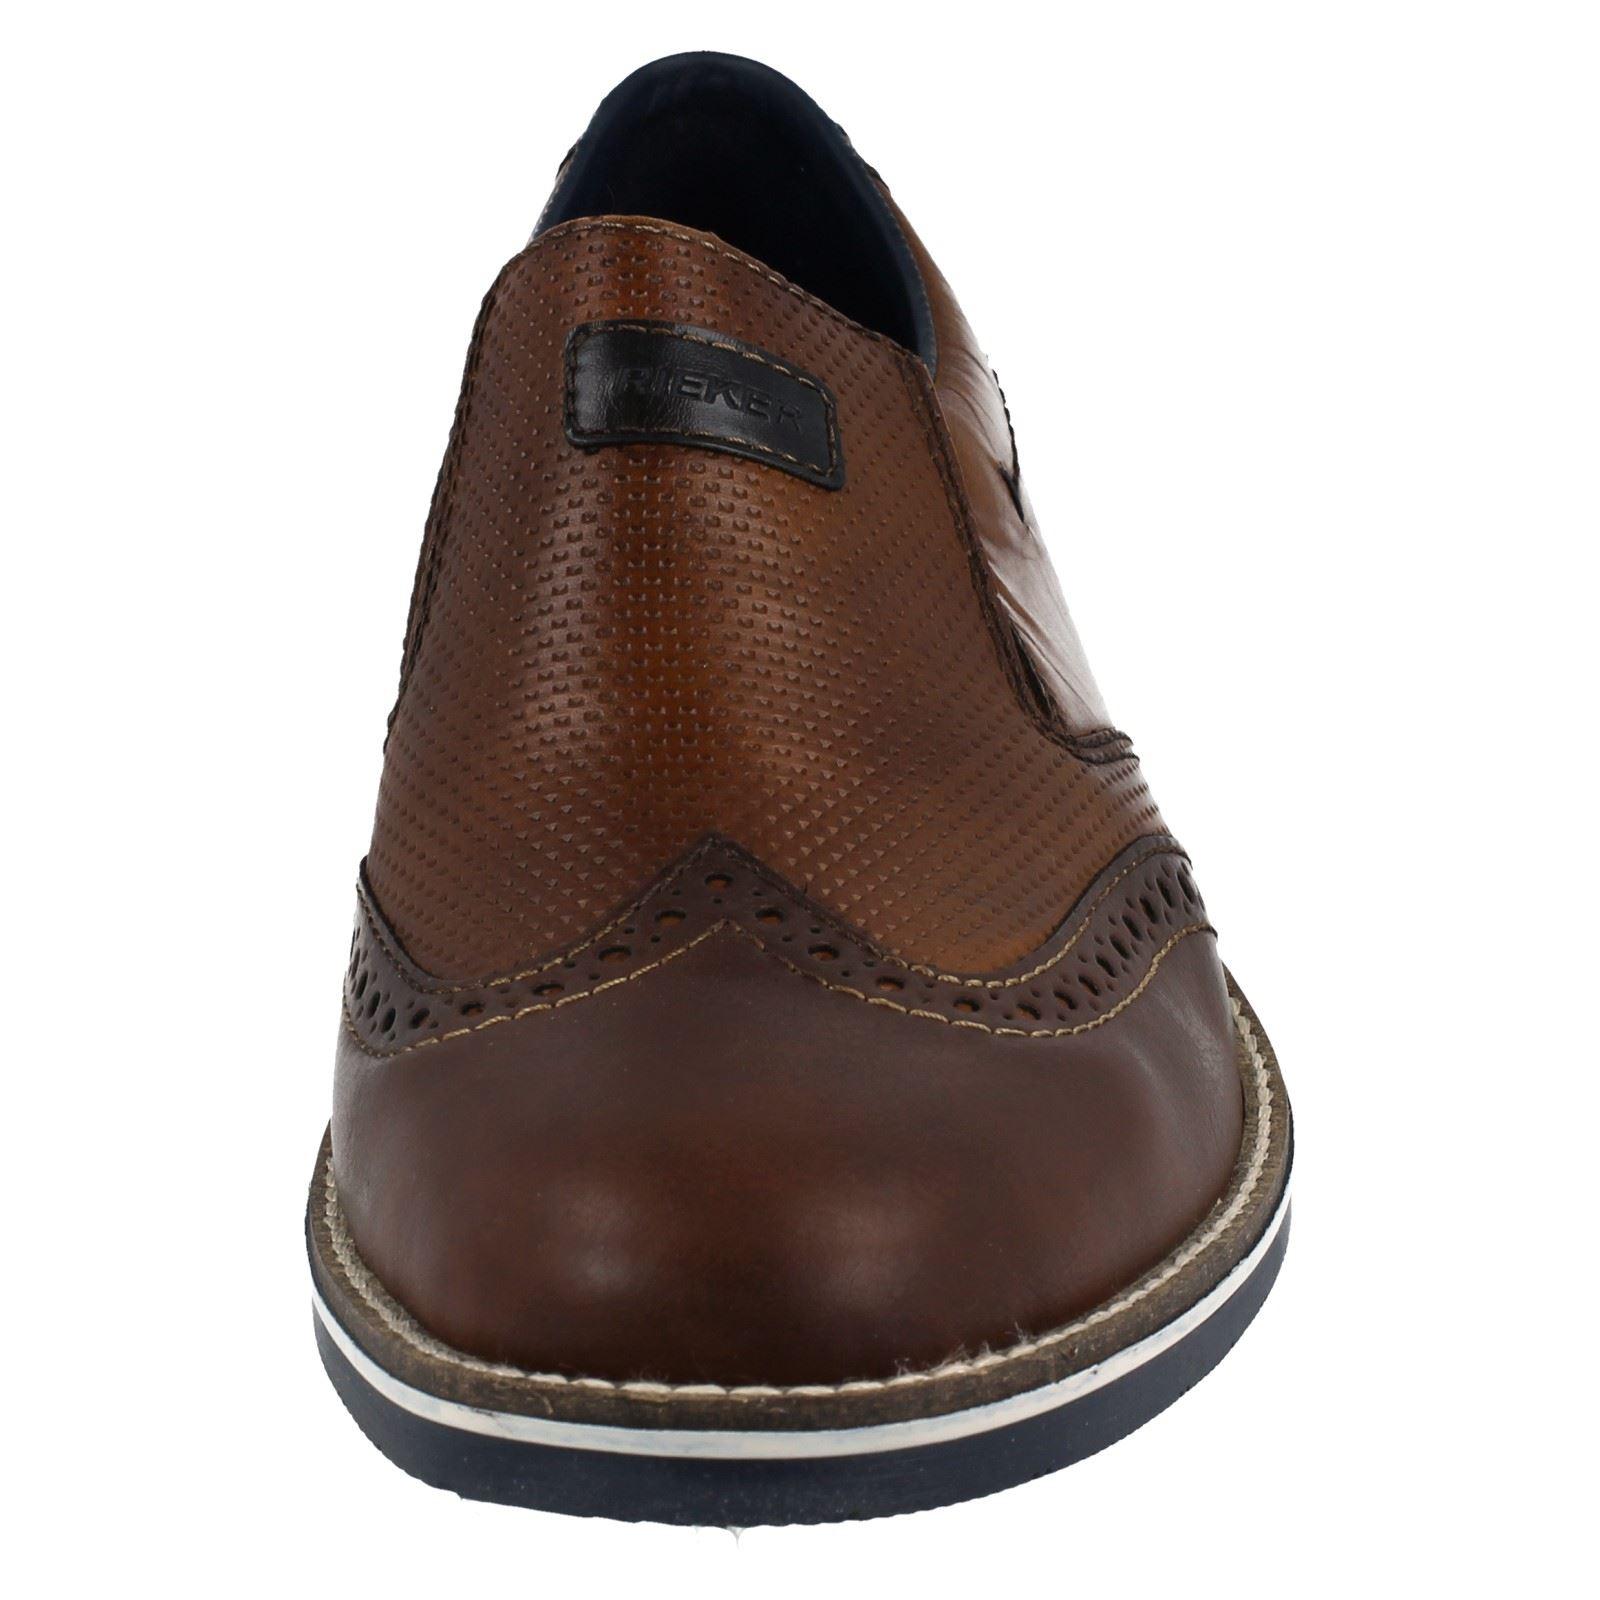 Mens Rieker Formal Shoes 13560